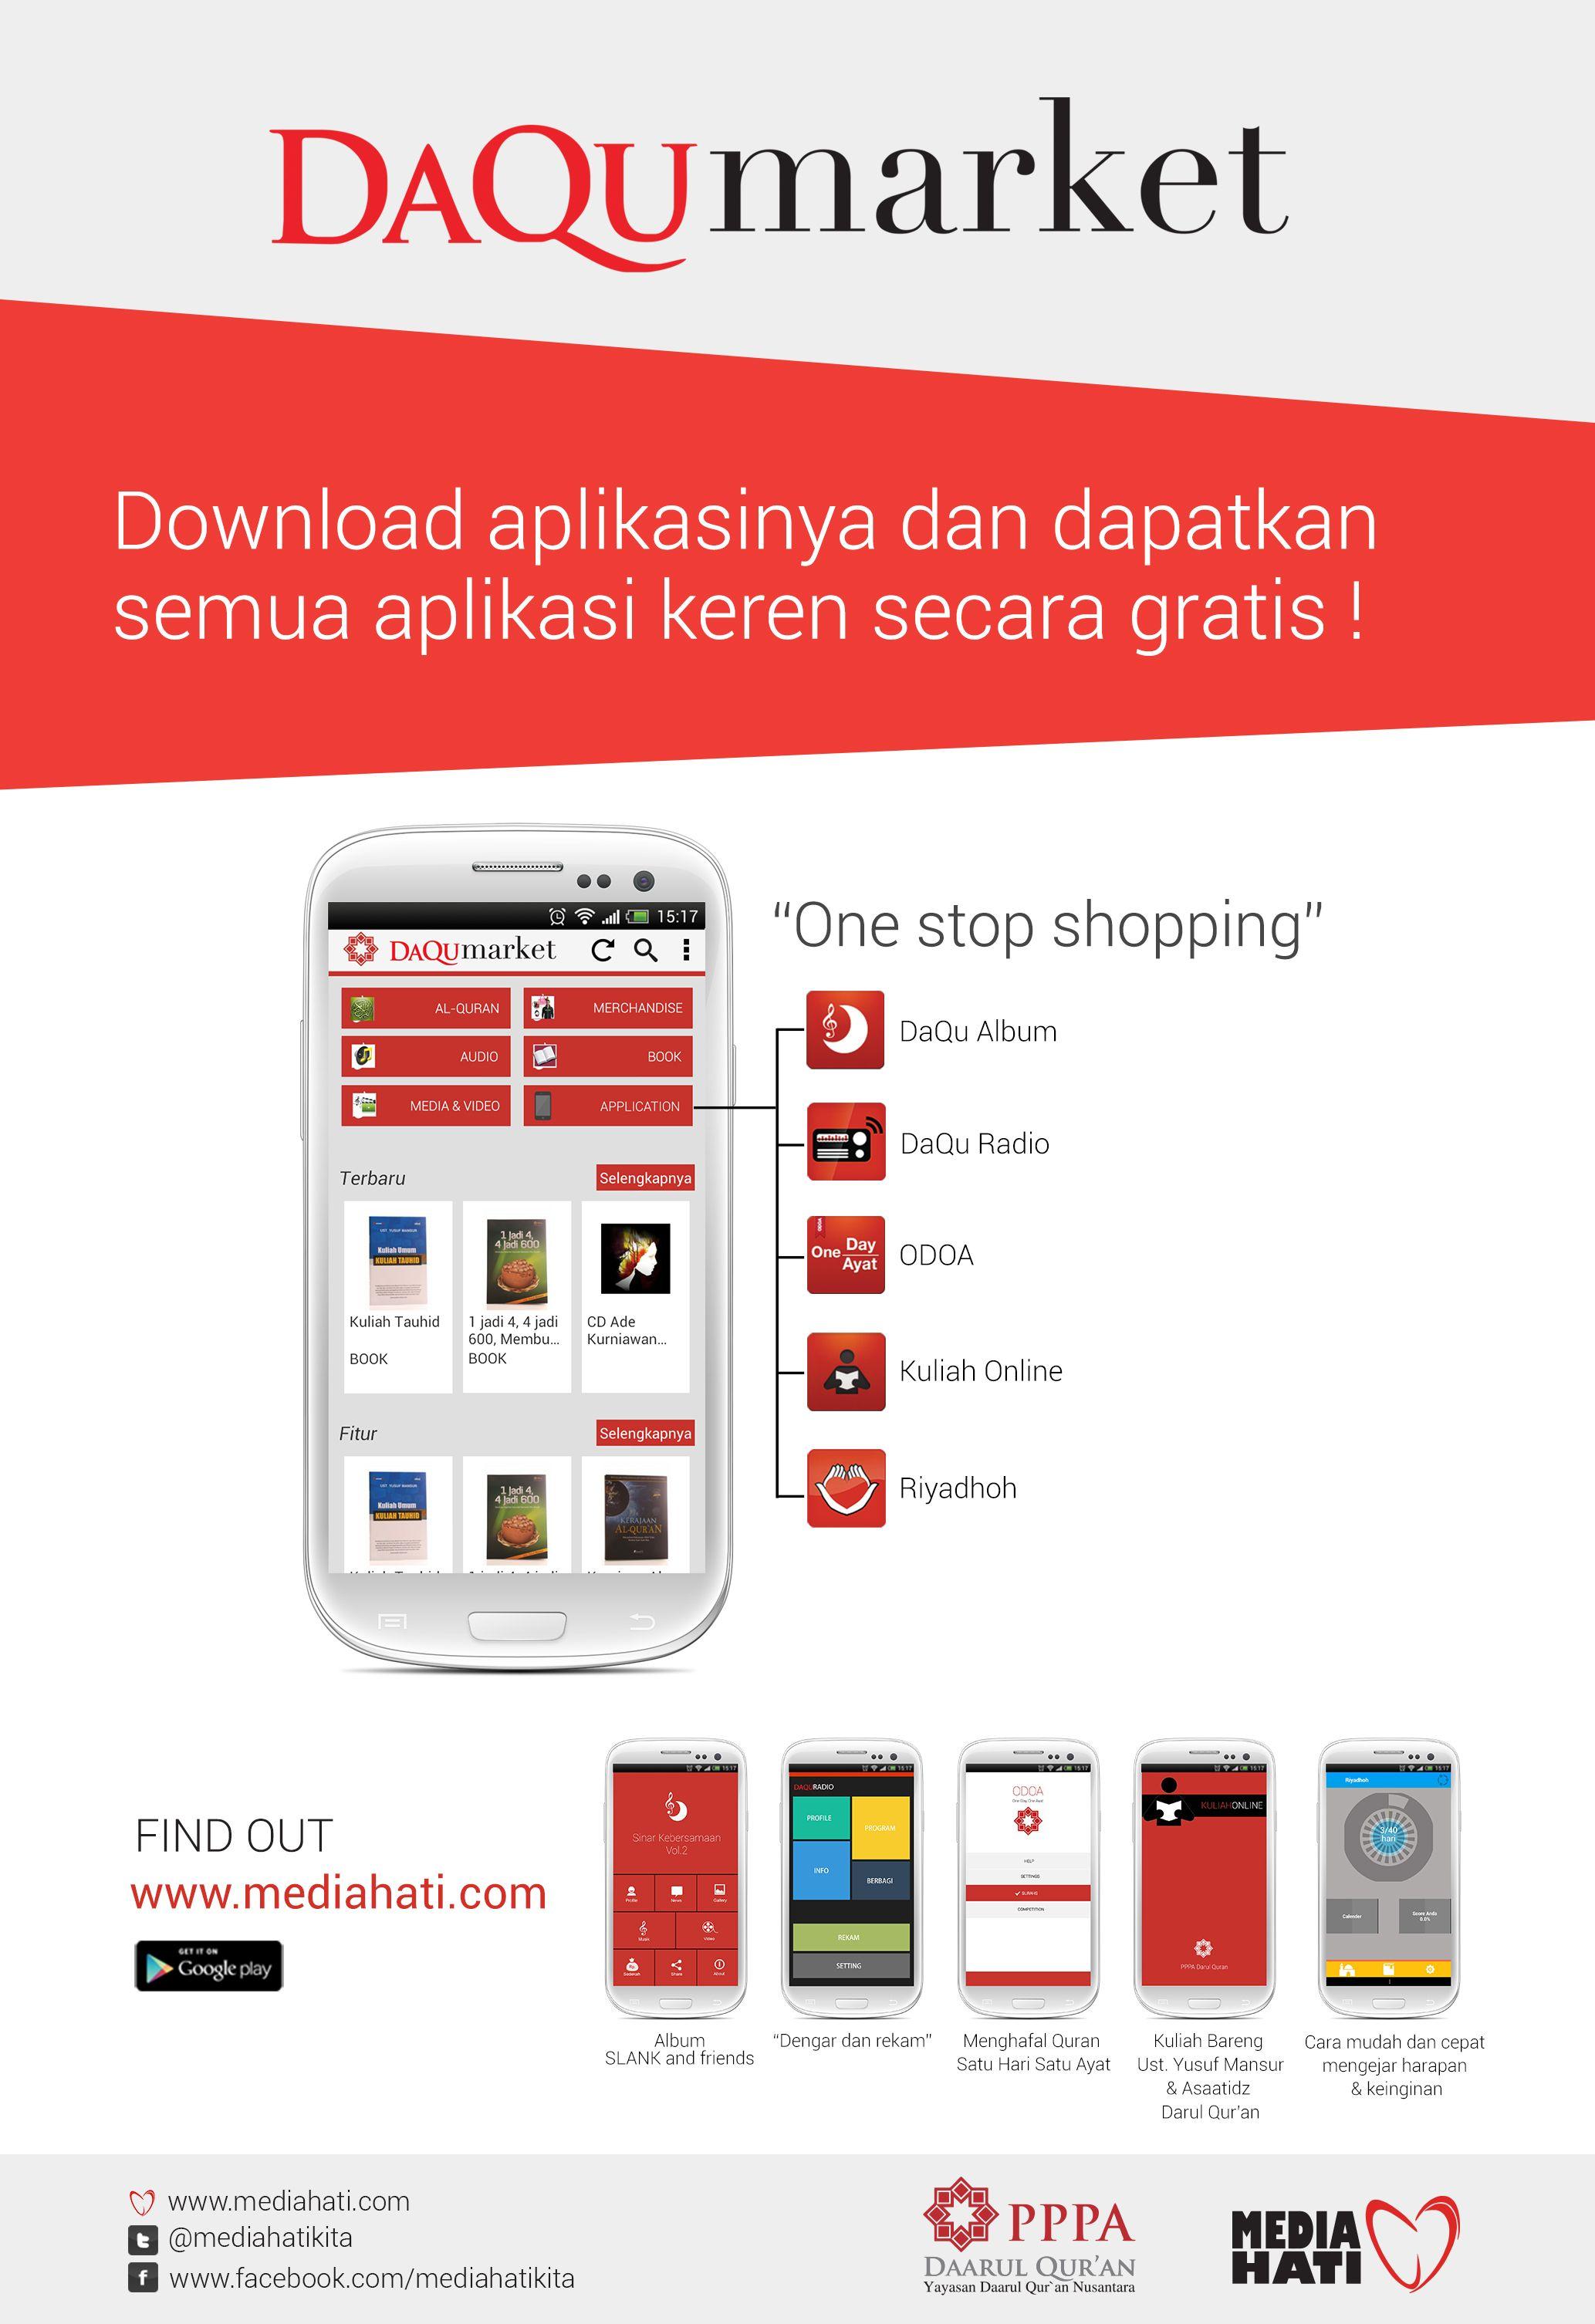 Download aplikasi DaQu Market di Google Play https://play.google.com ...